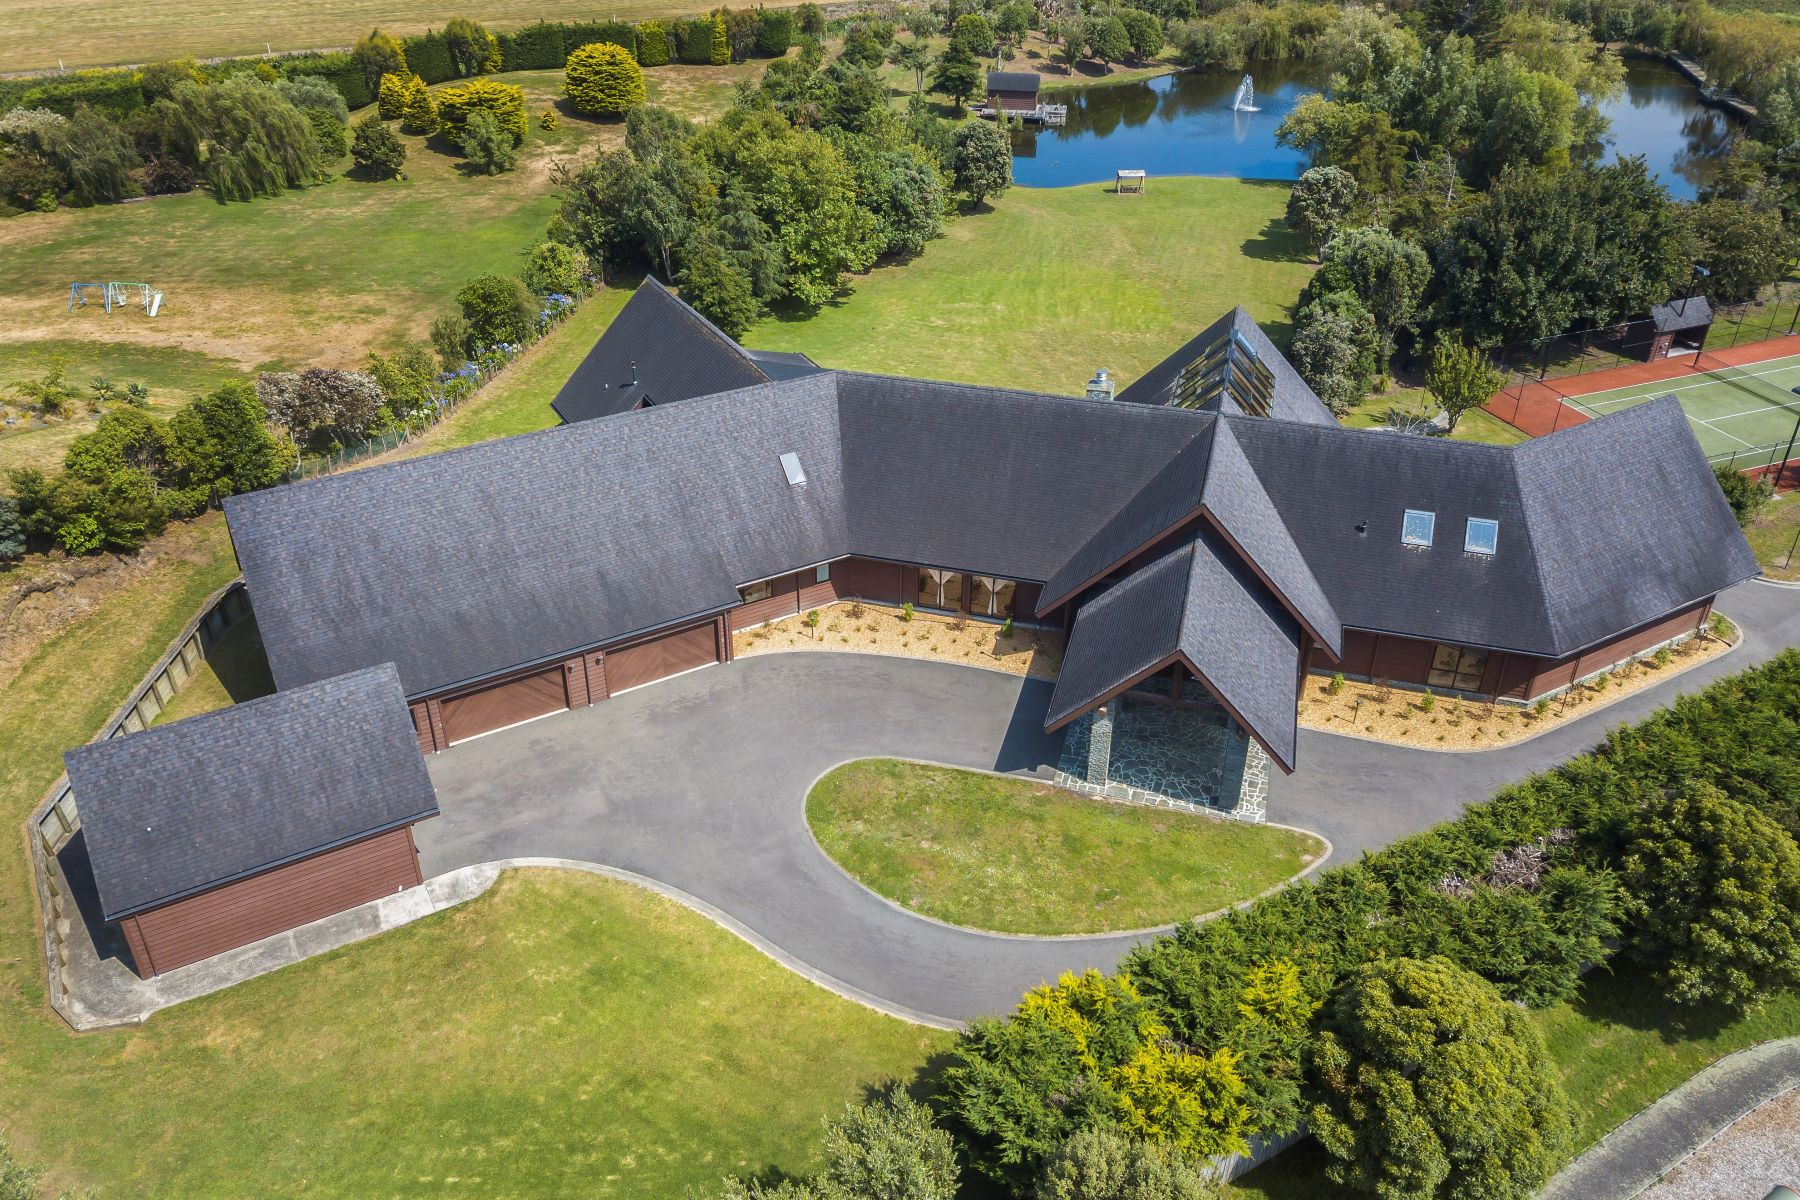 Single Family Homes για την Πώληση στο 132 Milne Drive, Paraparaumu Wellington, Ουελινγκτον 5032 Νεα Ζηλανδια